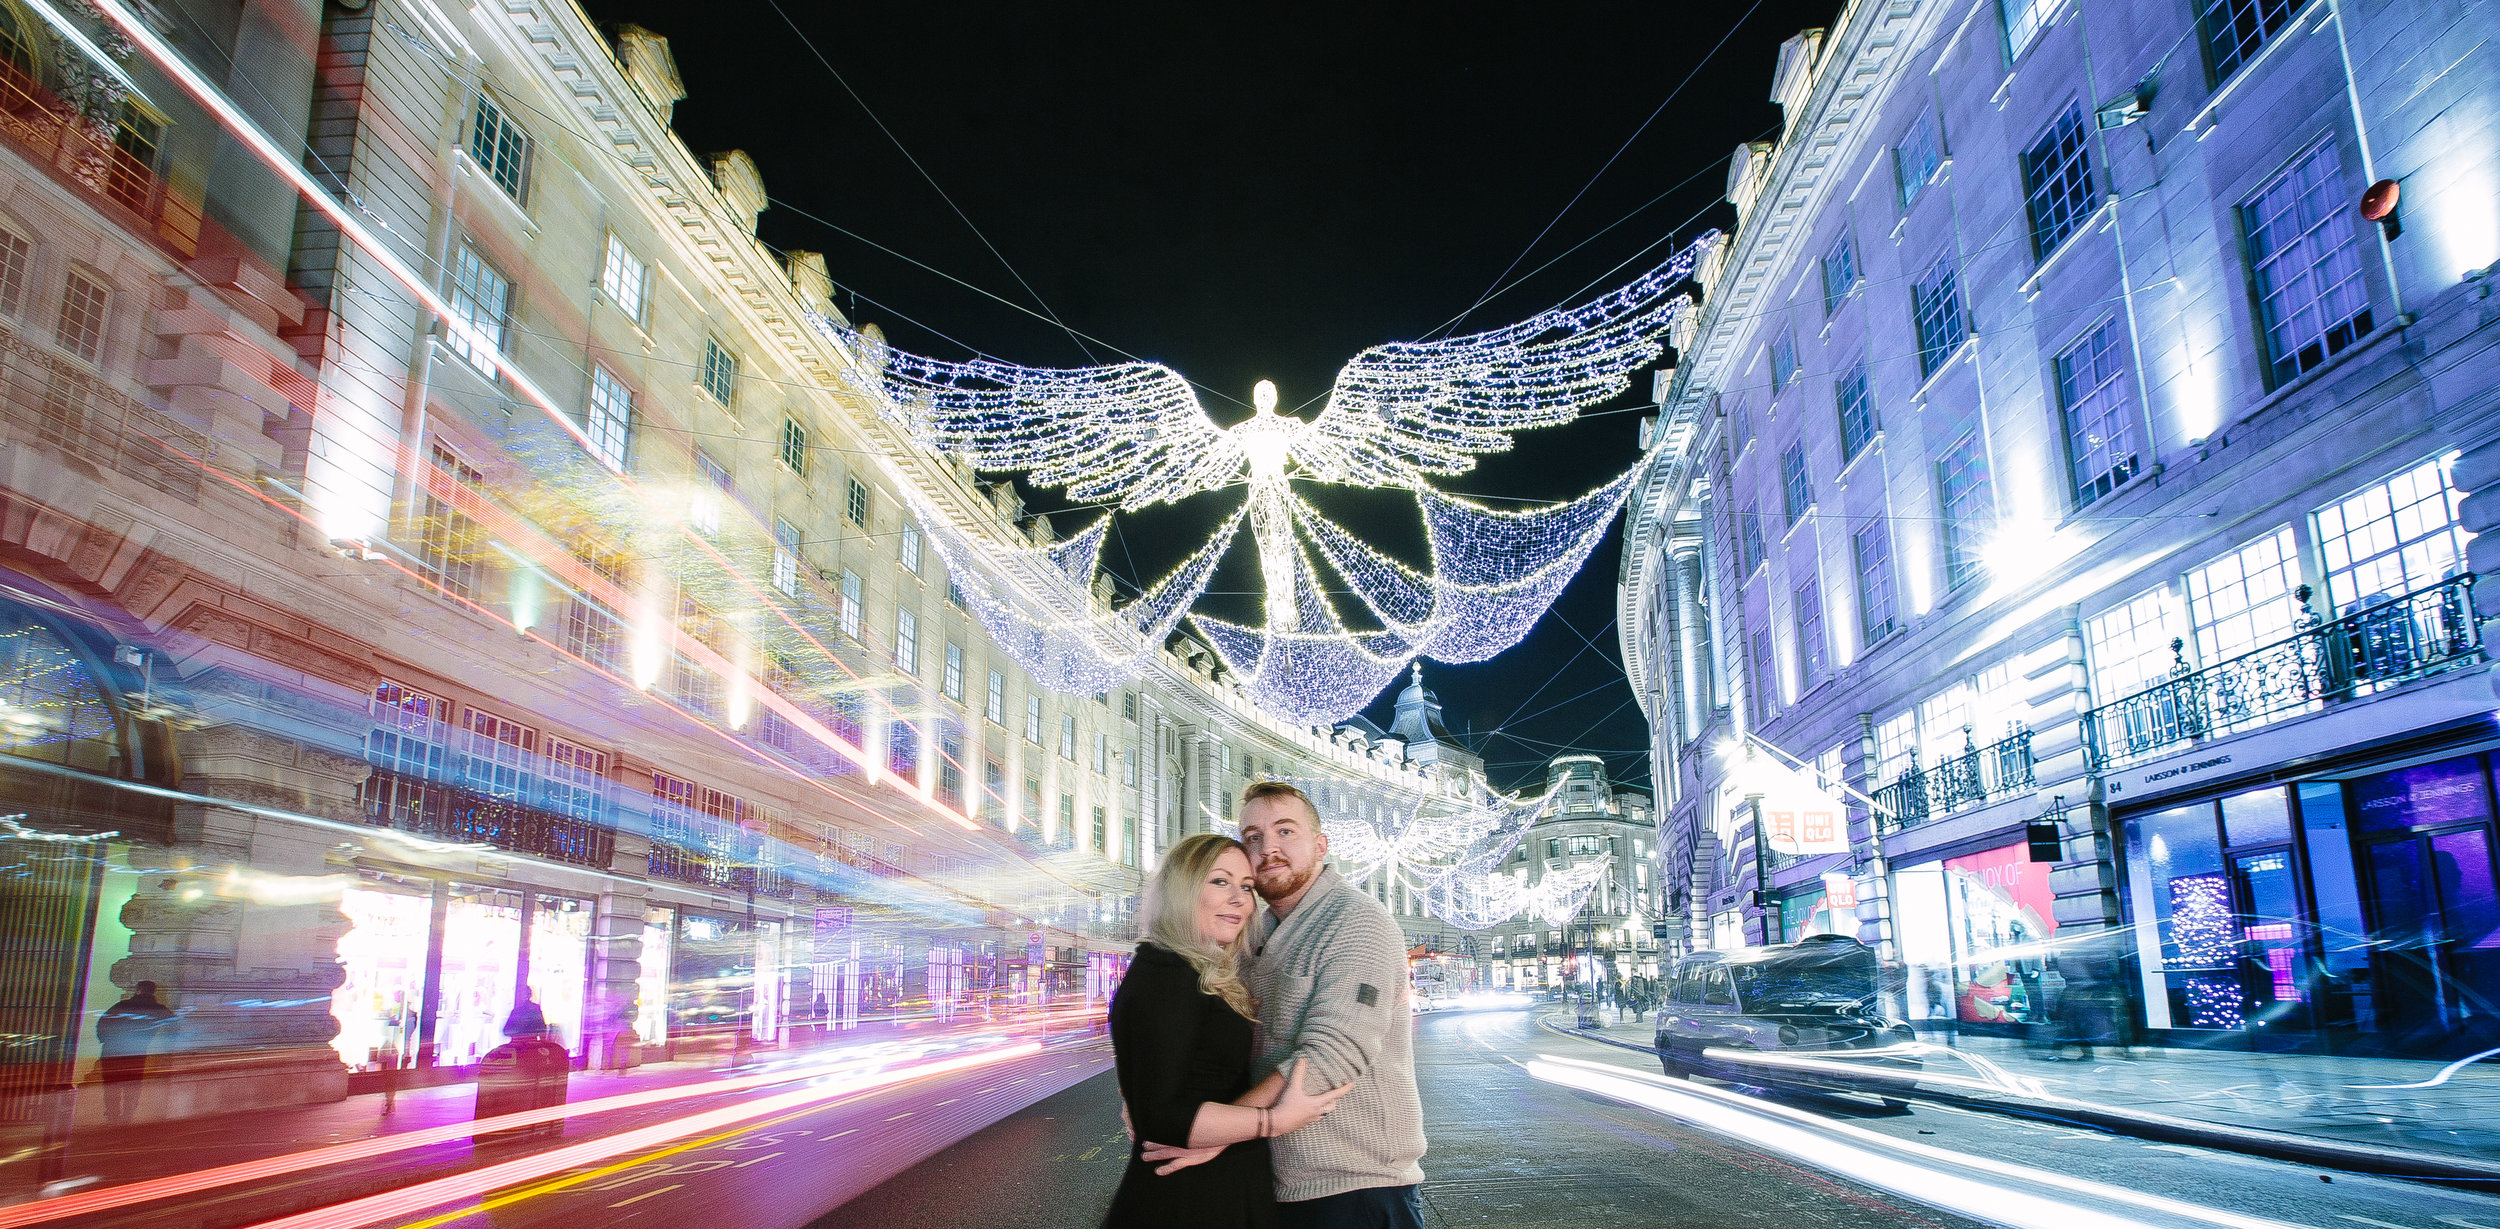 london-oxford-street-christmas-lights-engagement-wedding-photography-18